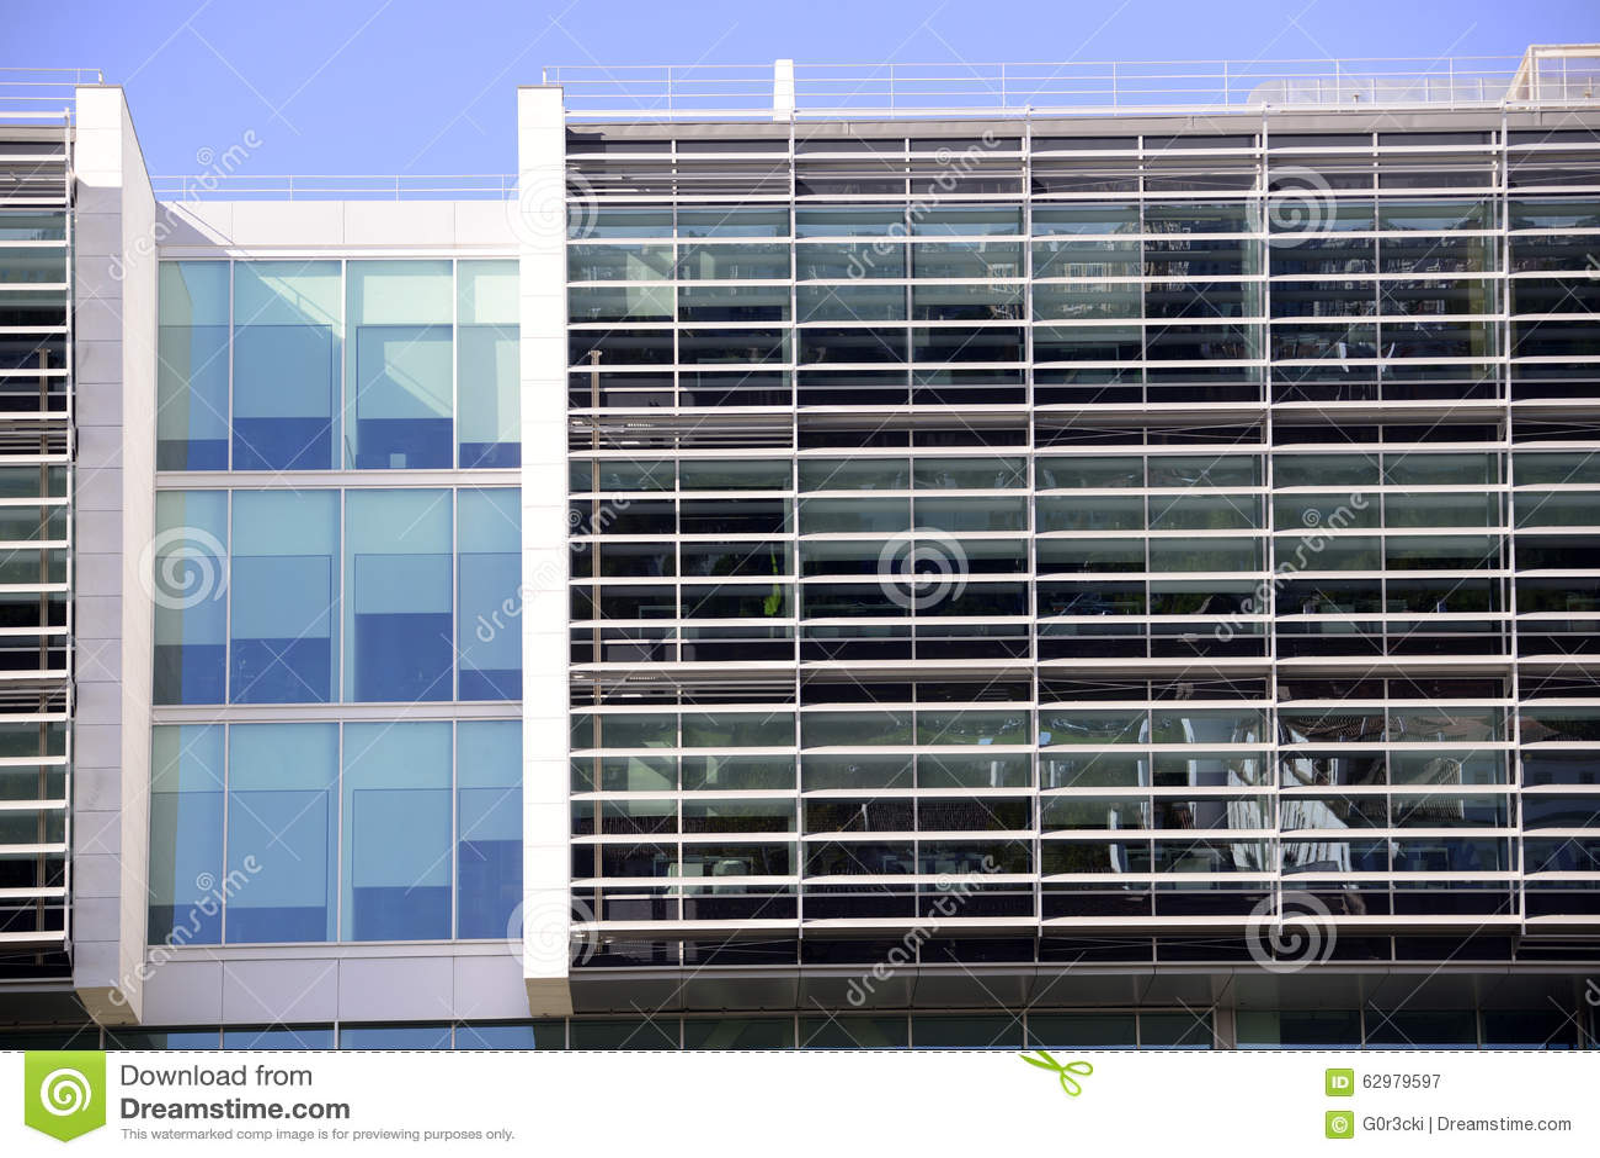 Fassade bürogebäude  Moderne Architektur, Bürogebäude-Fassade, Arbeitsplätze Stockfoto ...